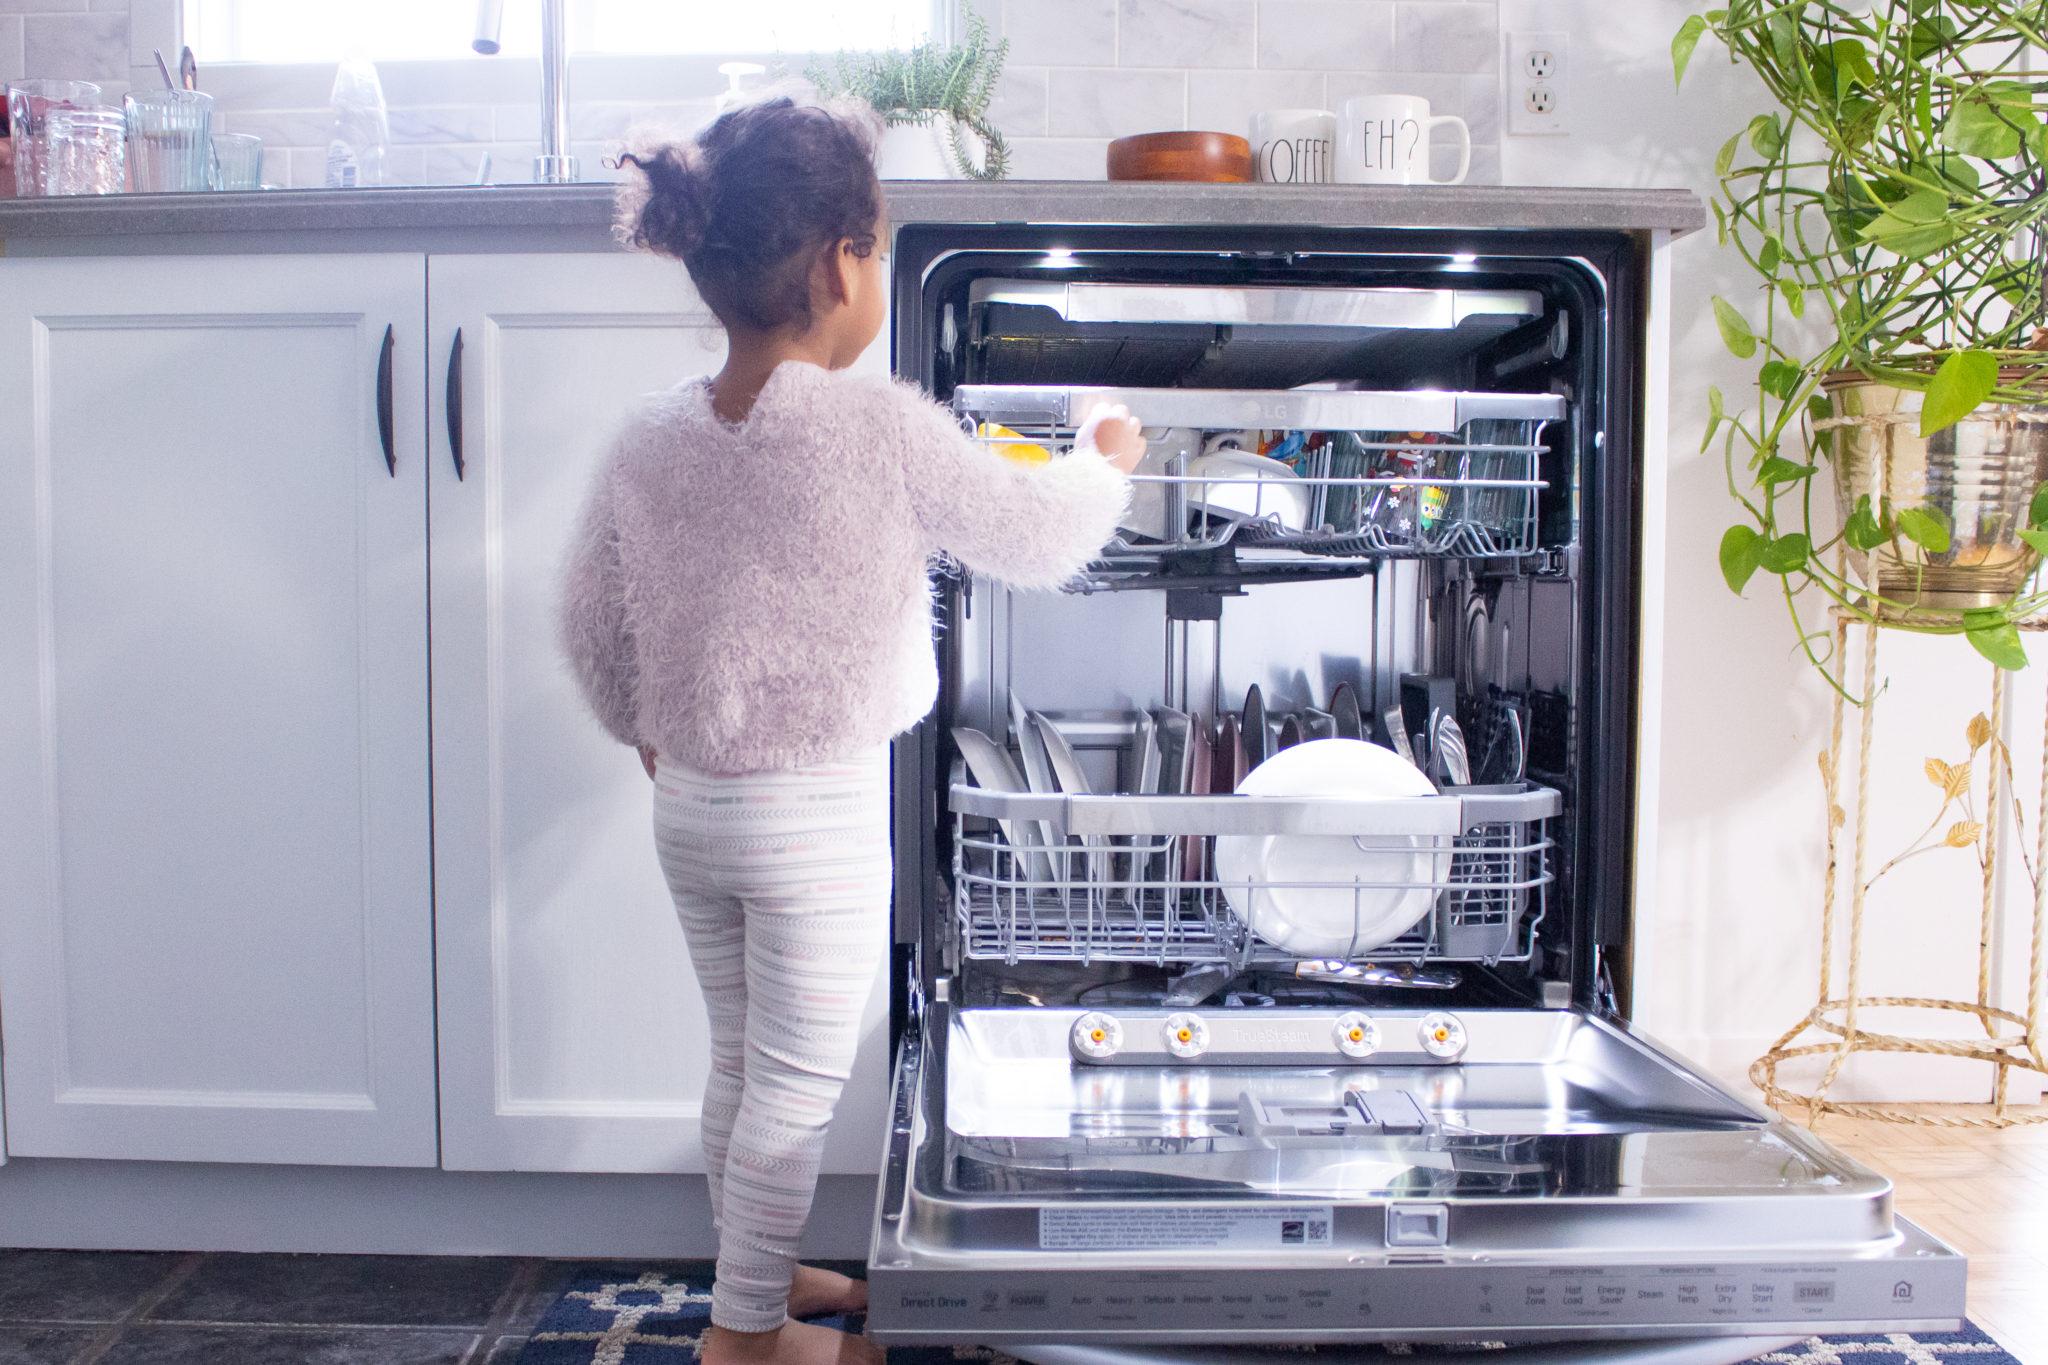 Easy Toddler Chores | LG QuadWash Steam Dishwasher Review